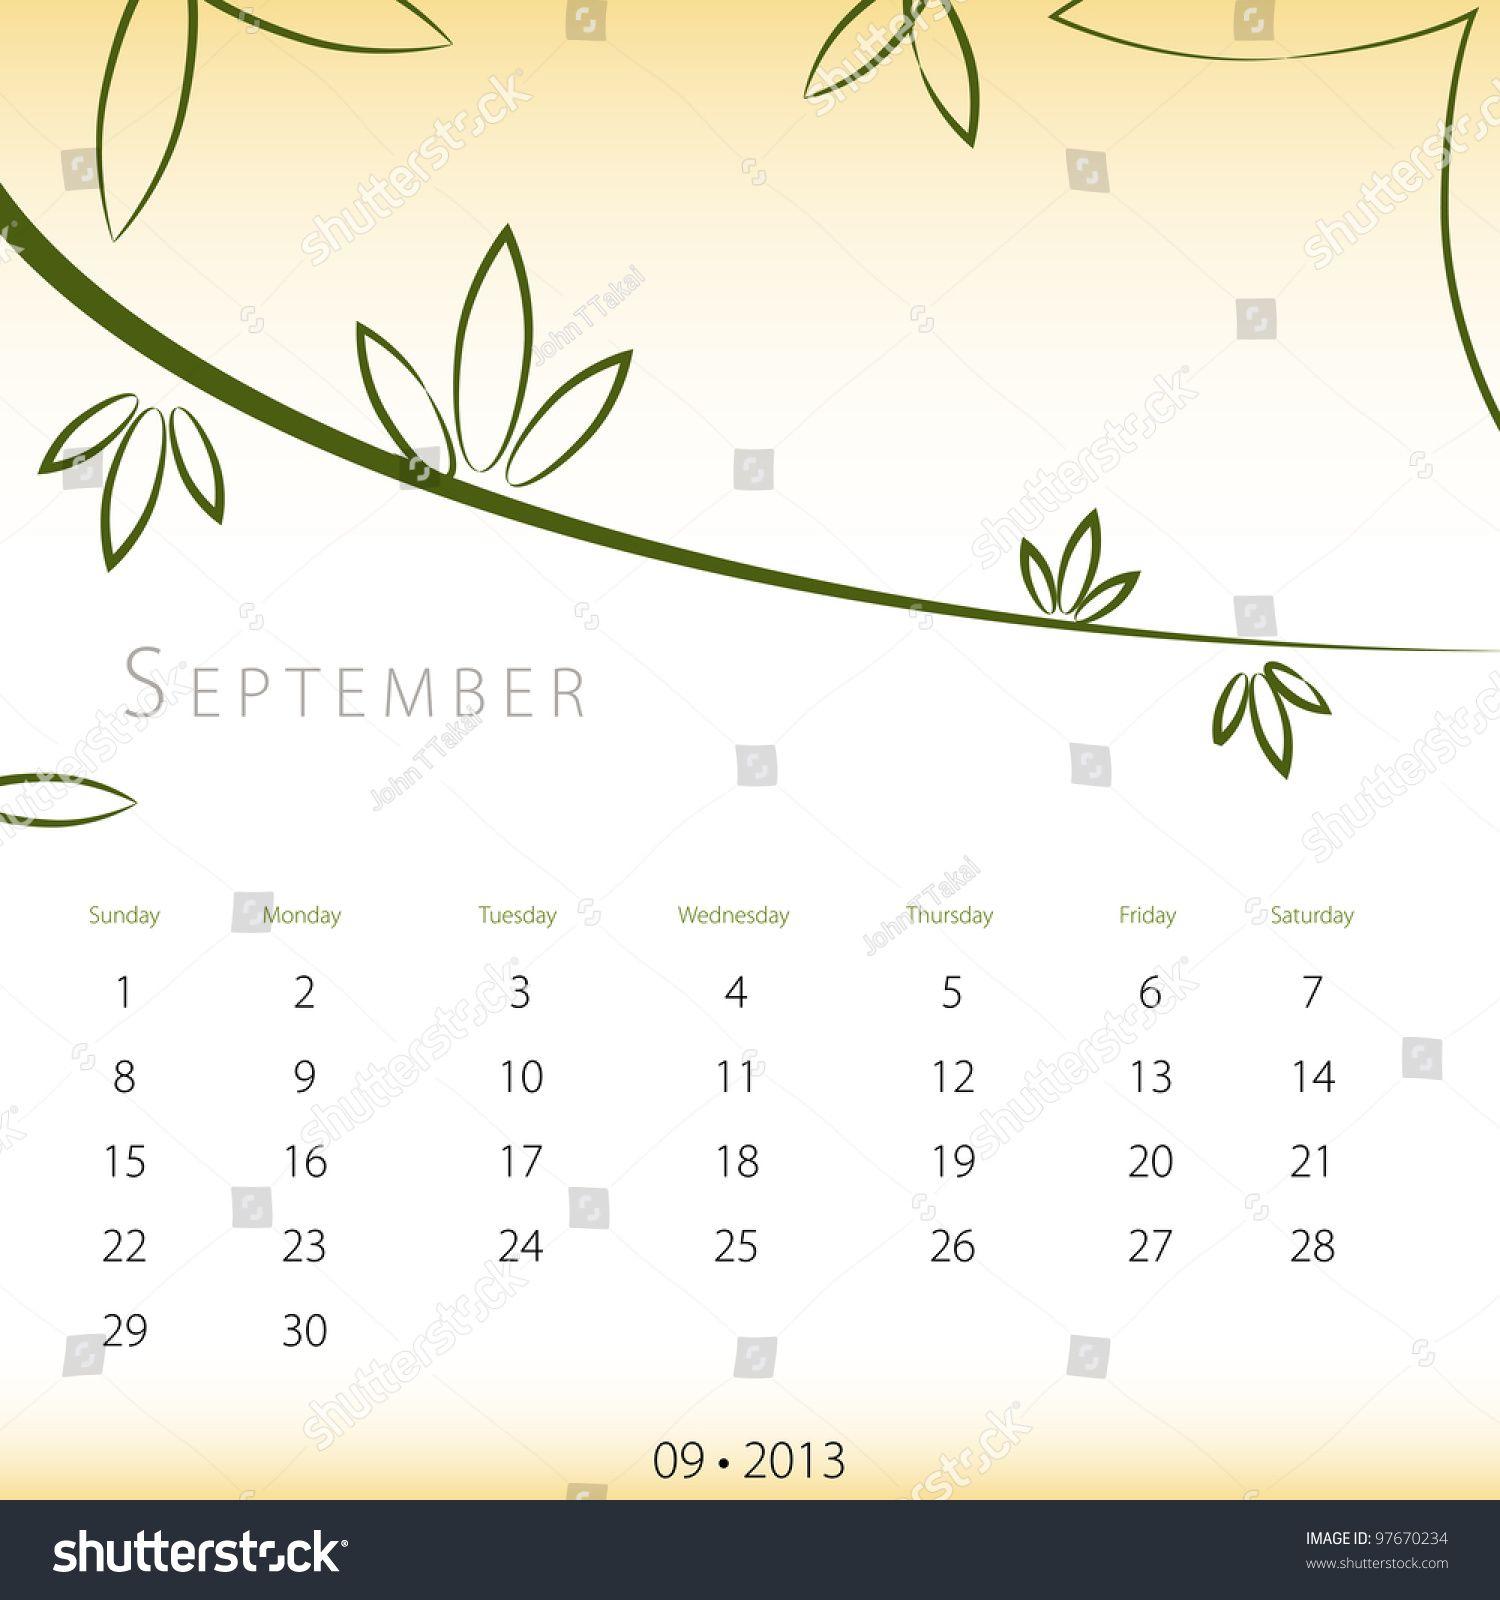 June 2013 Calendar Printable June 2013 Calendar Printable June